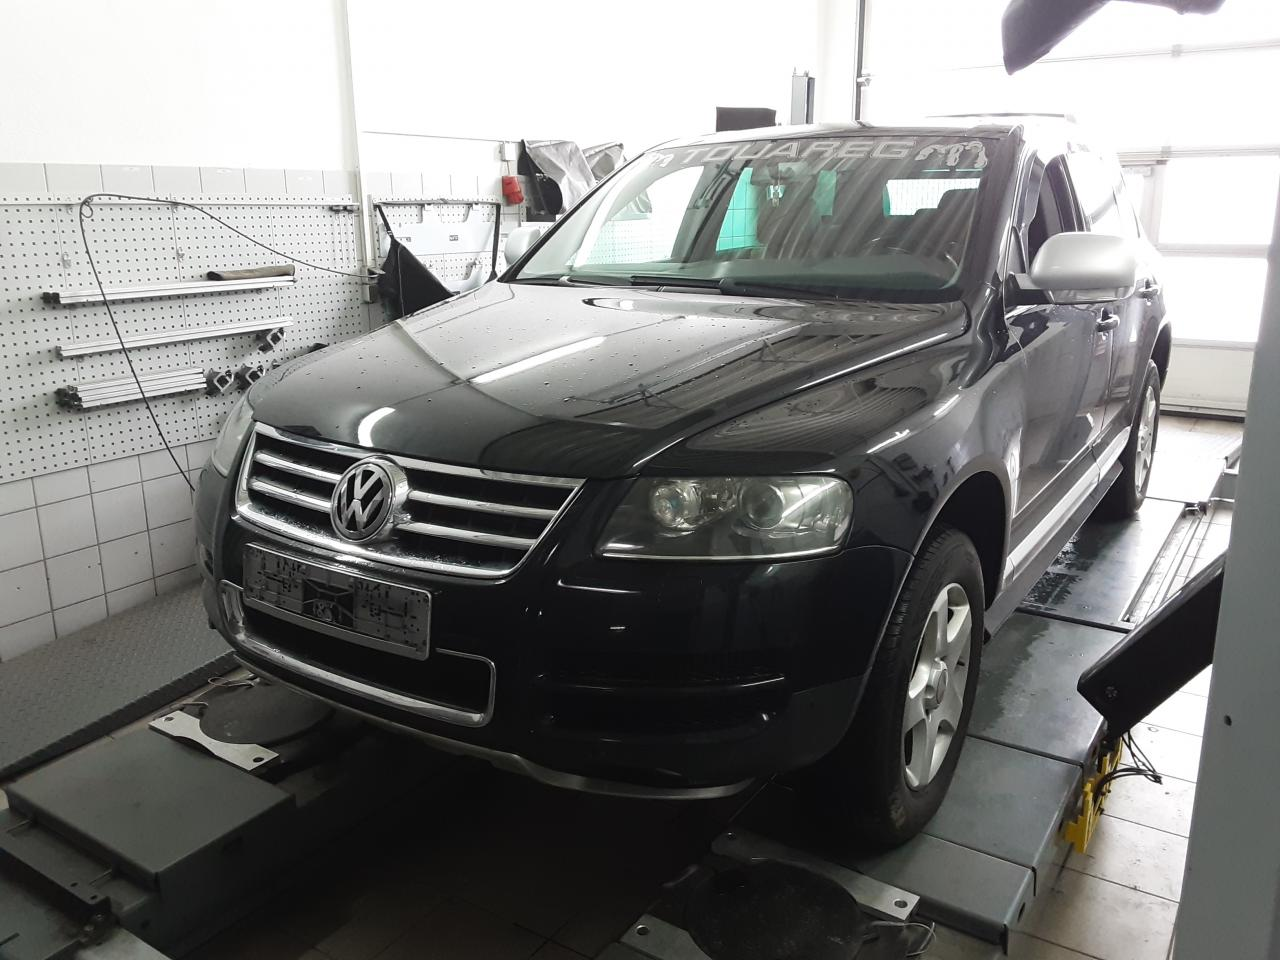 Volkswagen Touareg V6 TDI Kong